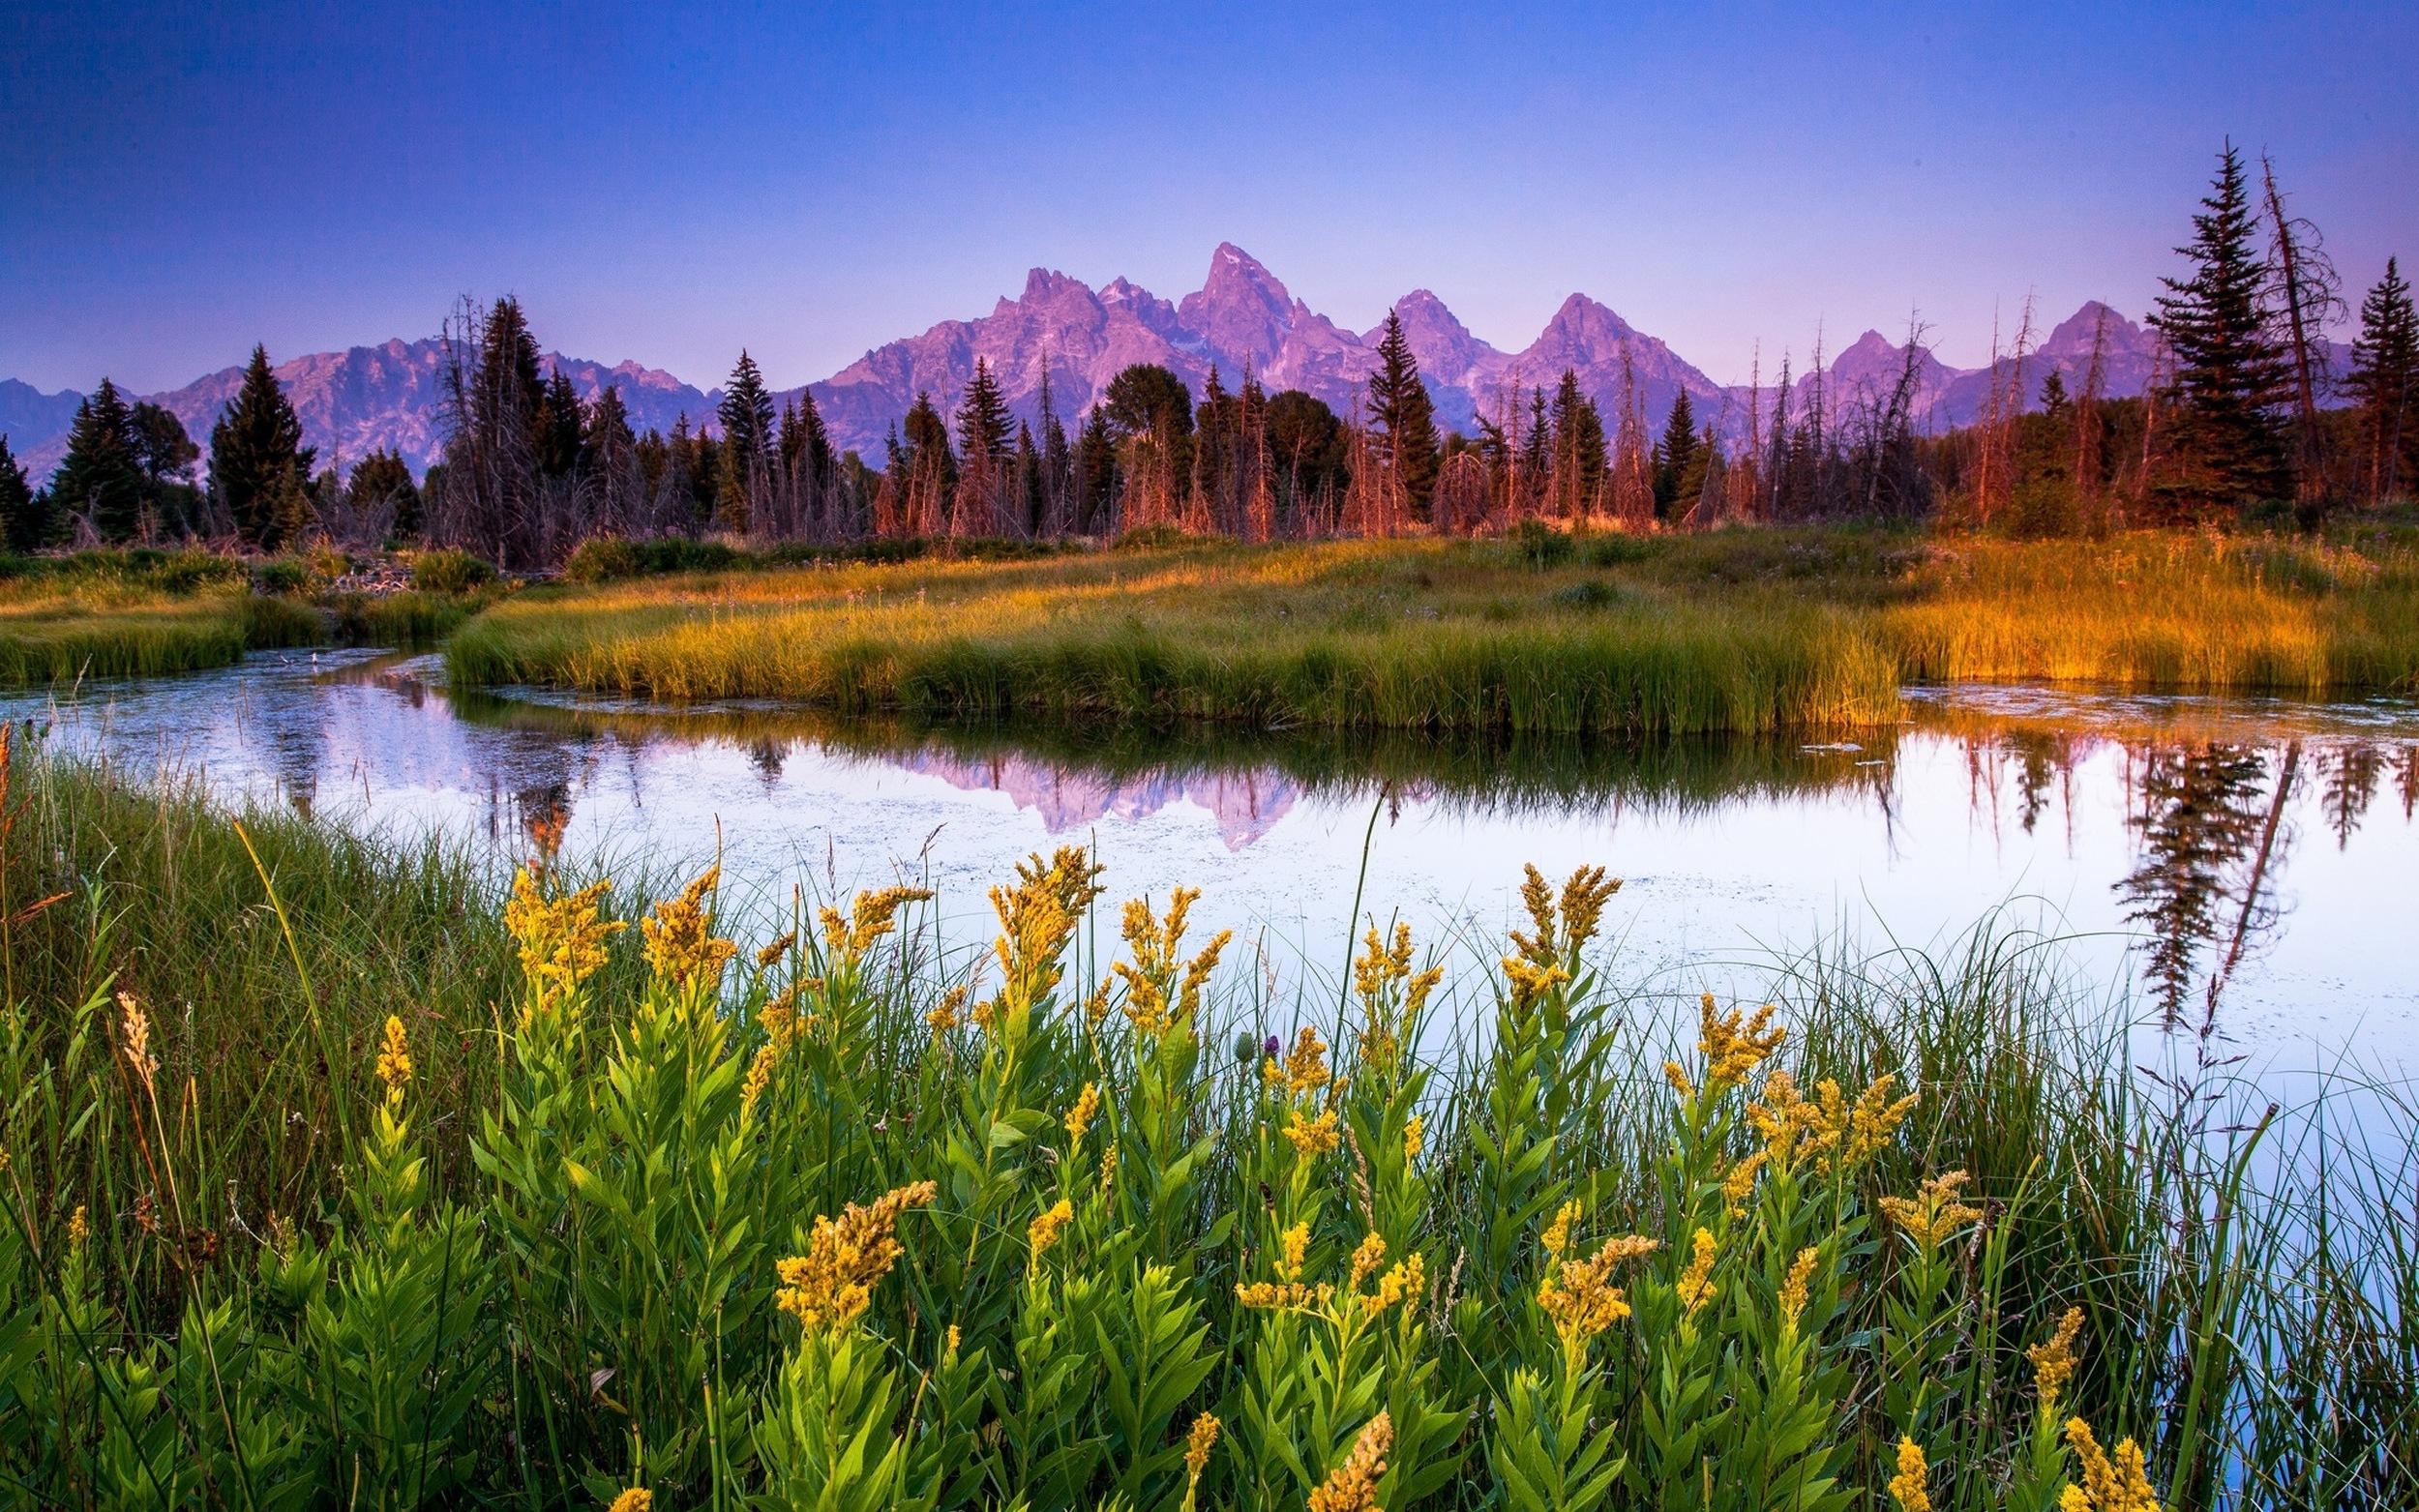 grand-teton-national-park-wyoming-usa-nature-2560x1600-wallpaper95544.jpg